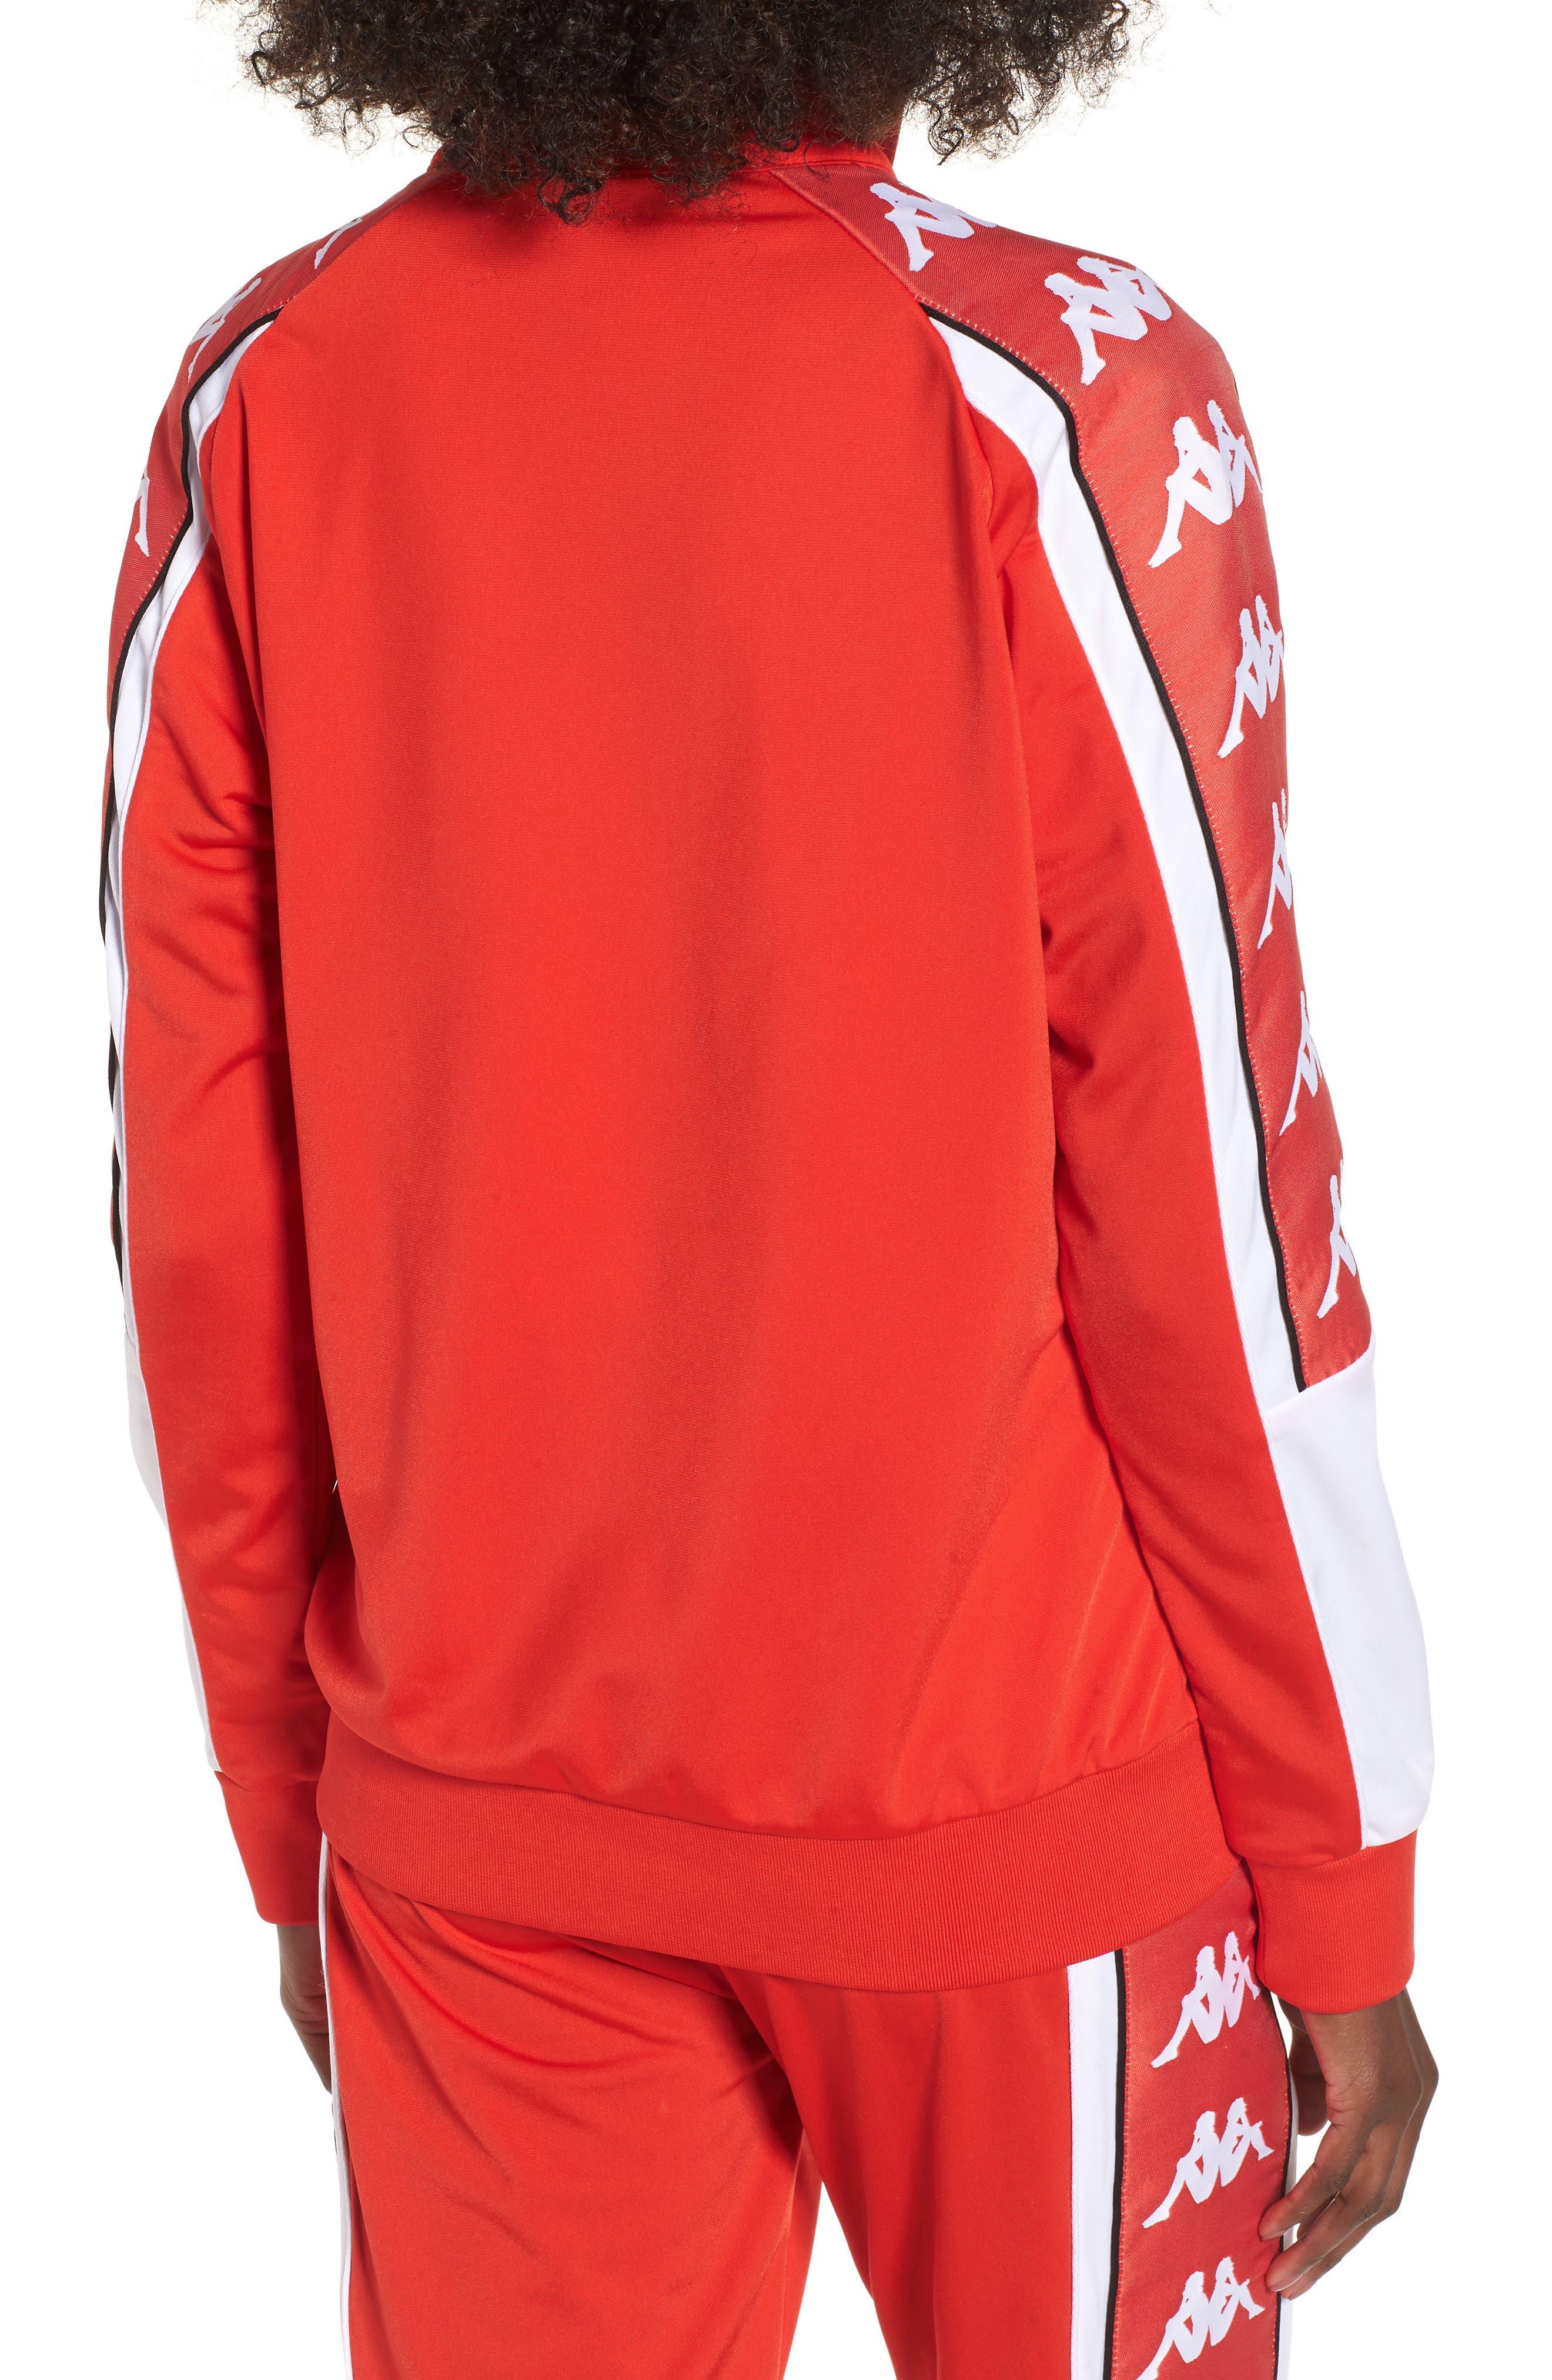 222 Banda 10 Anay Jacket,                             Alternate thumbnail 2, color,                             Red Flame -White